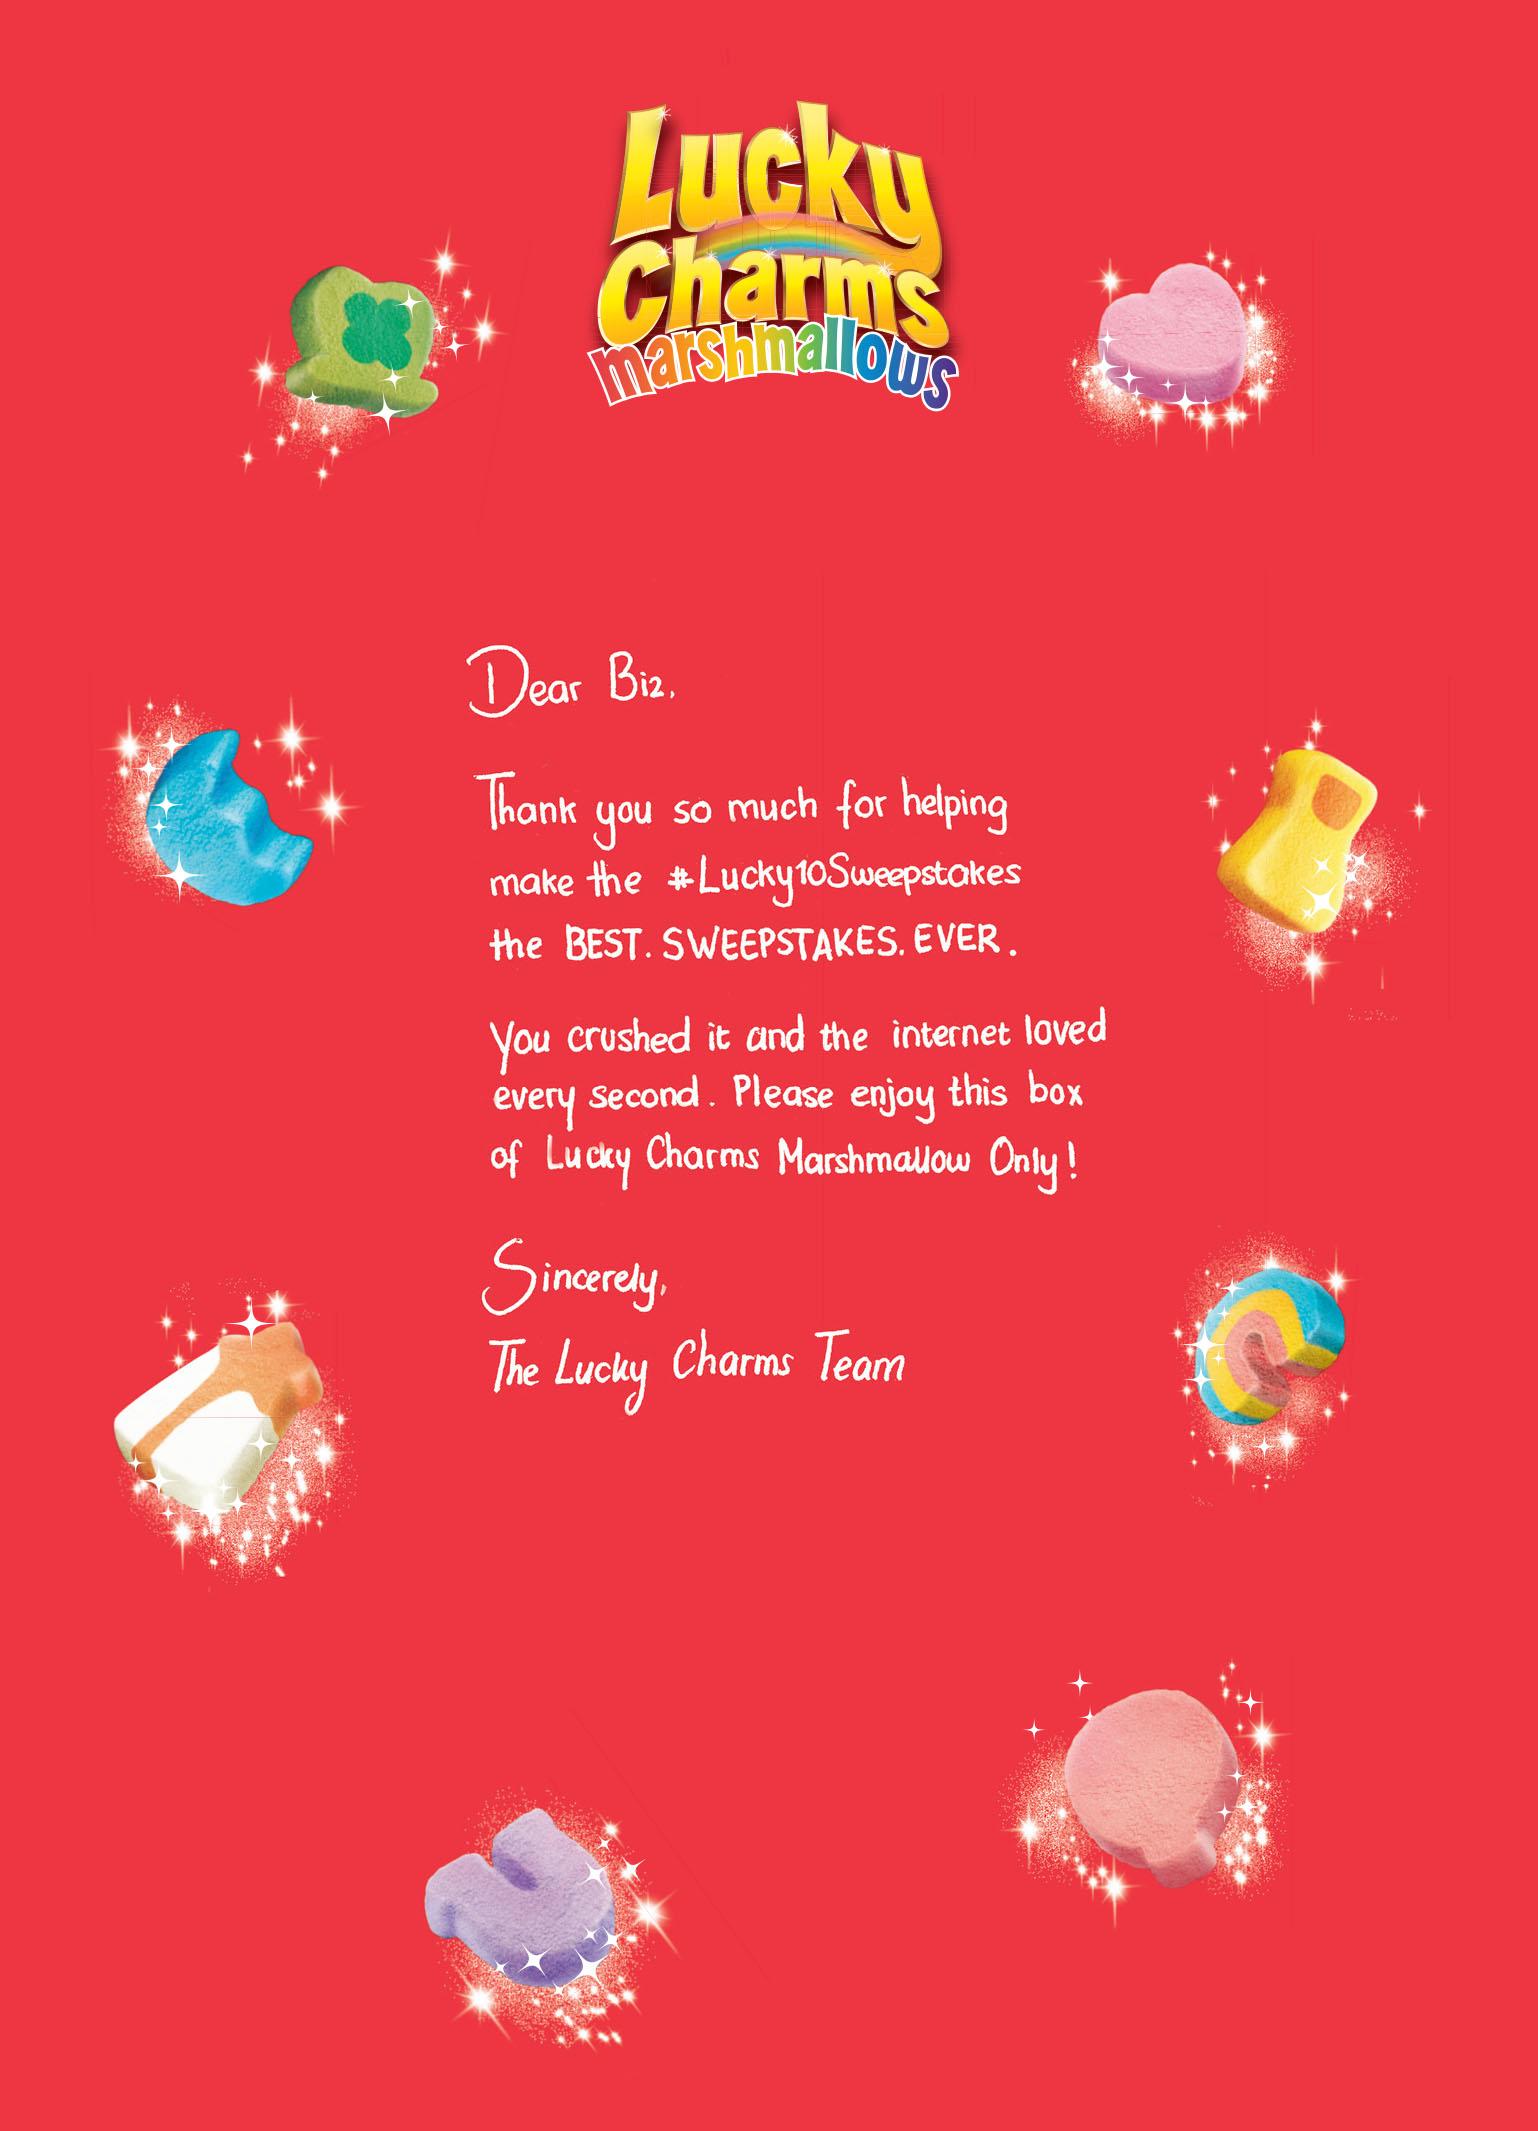 LuckyCharms_Letter_Front.jpg